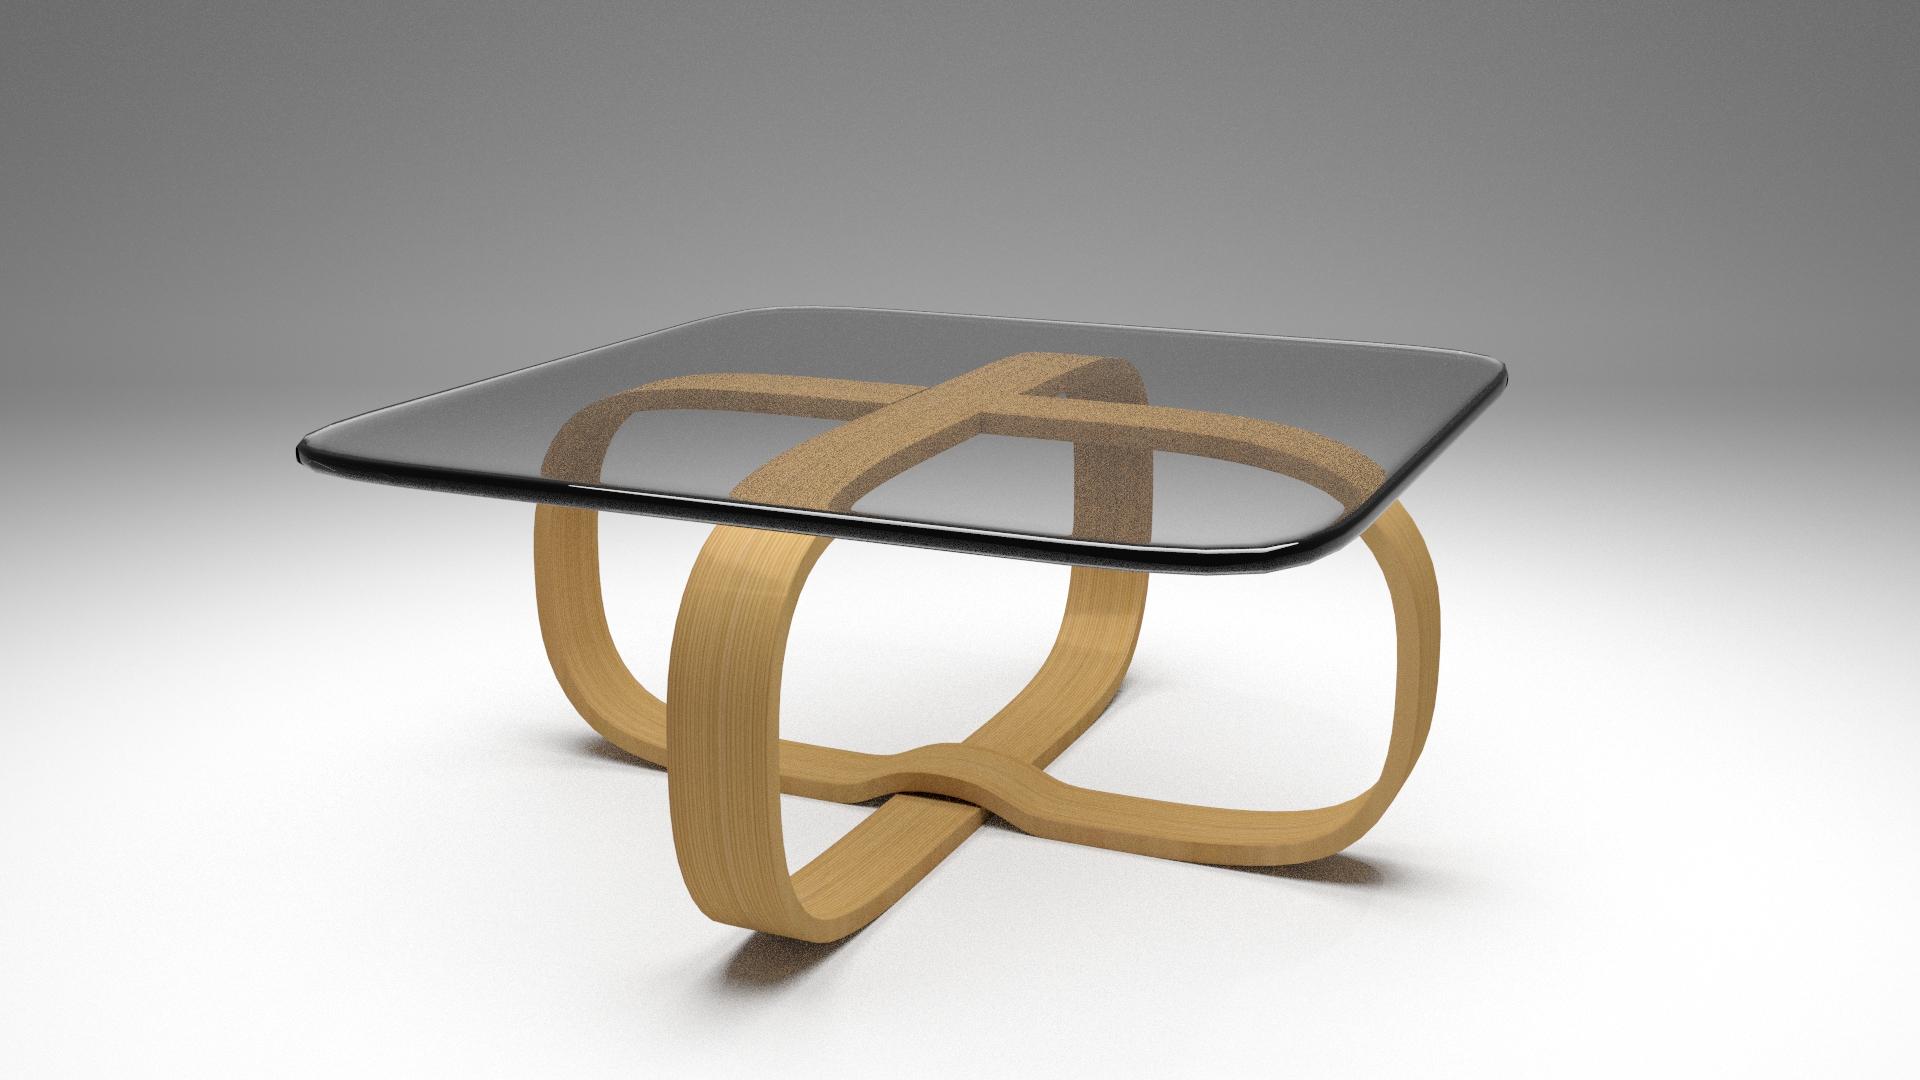 Stylized wooden table free 3d model 3ds fbx blend mtl for Table design 3d model